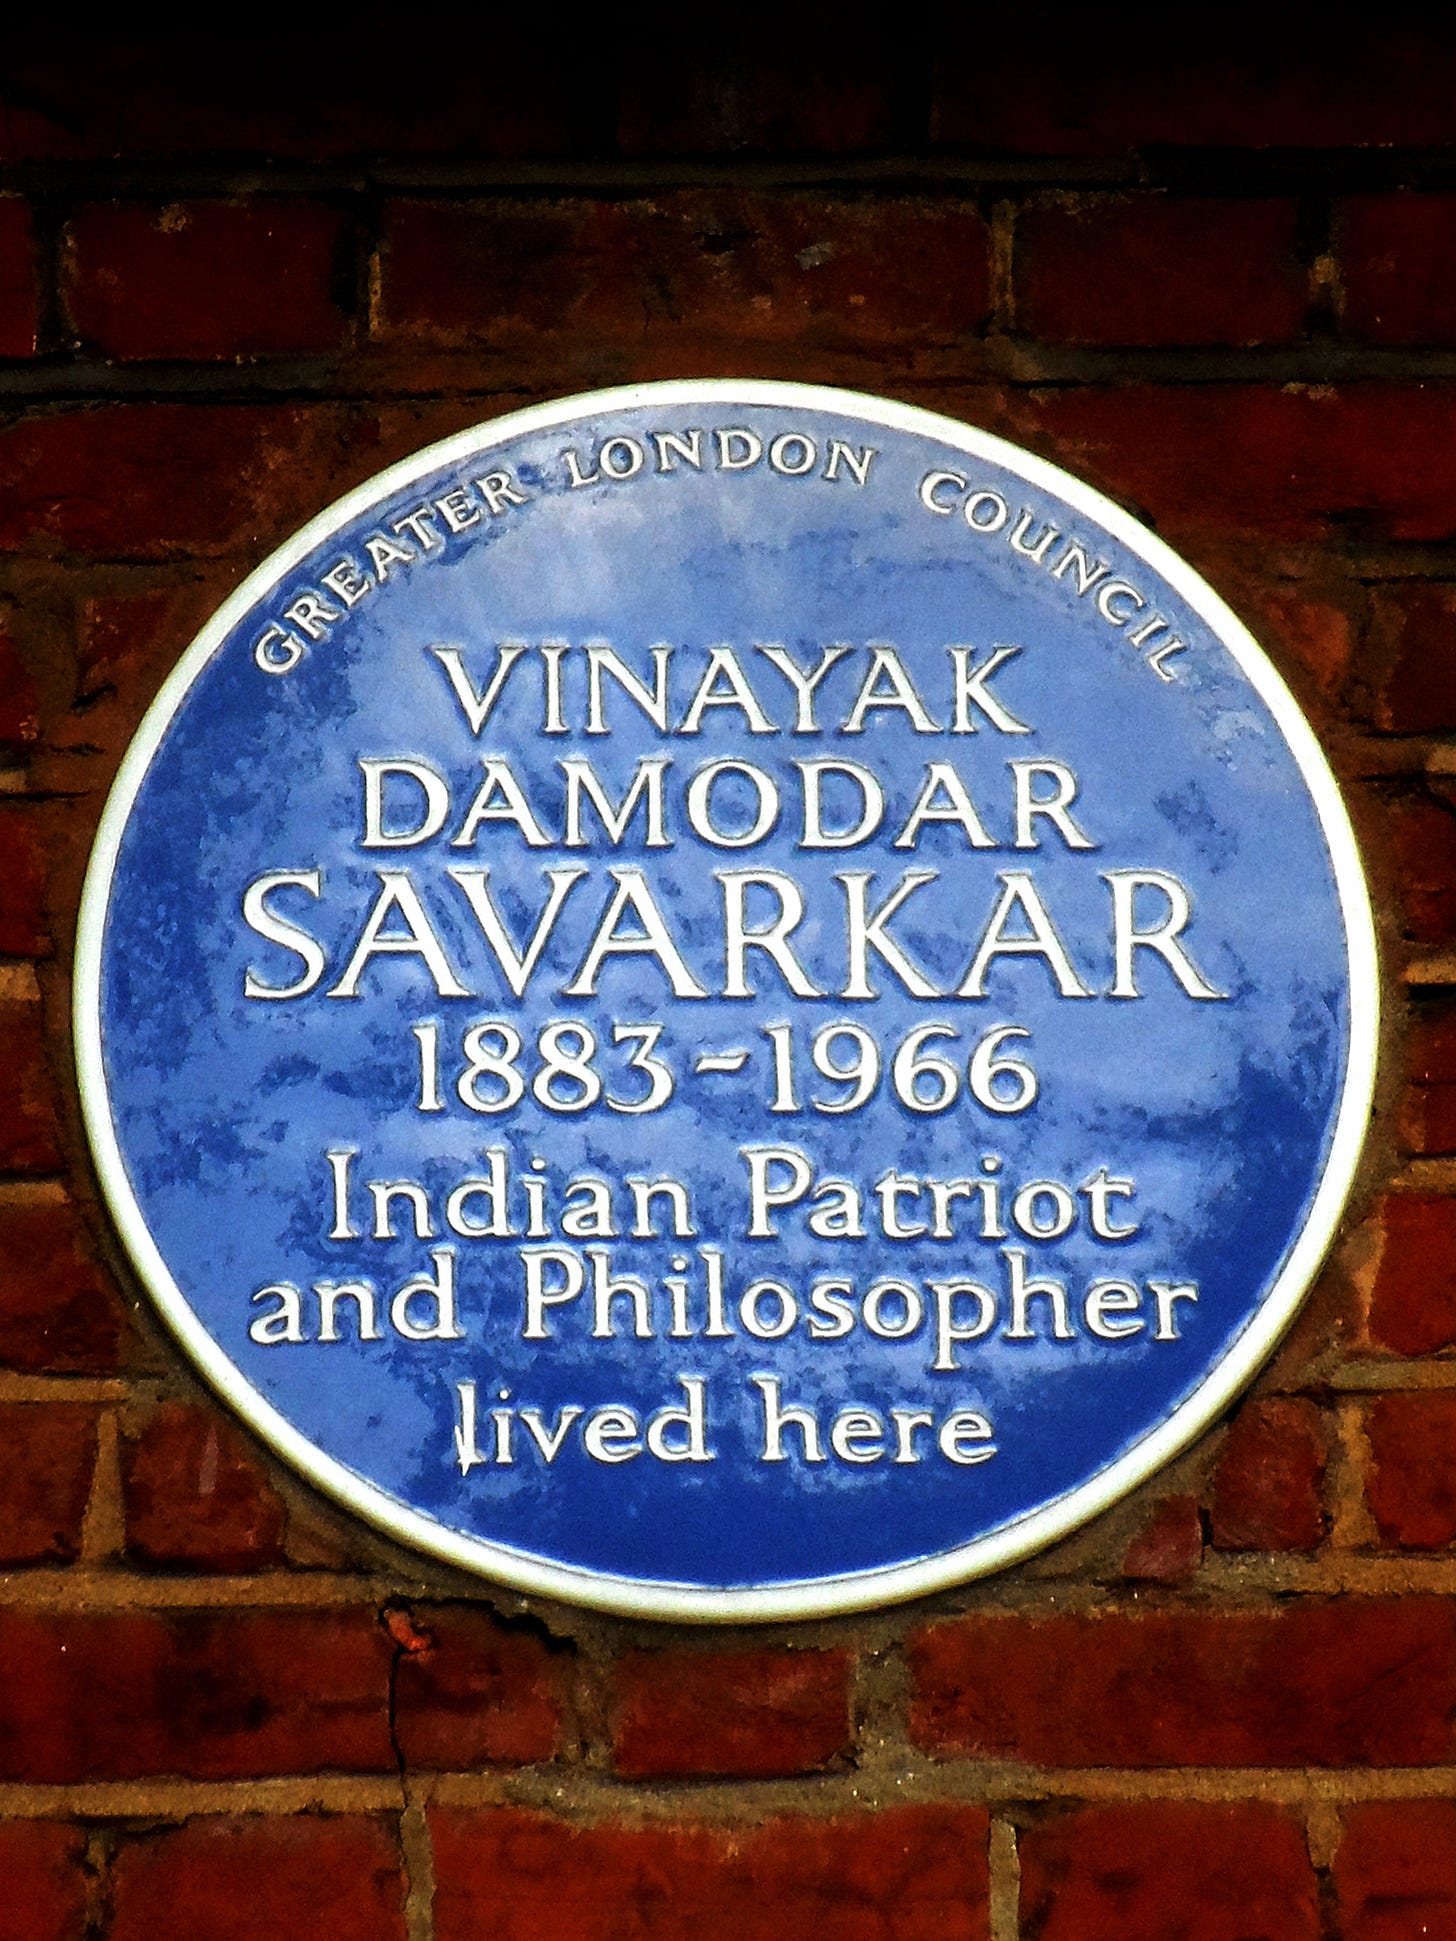 File:VINAYAK DAMODAR SAVARKAR's residence (English Heritage blue plaque).jpg  - Wikimedia Commons